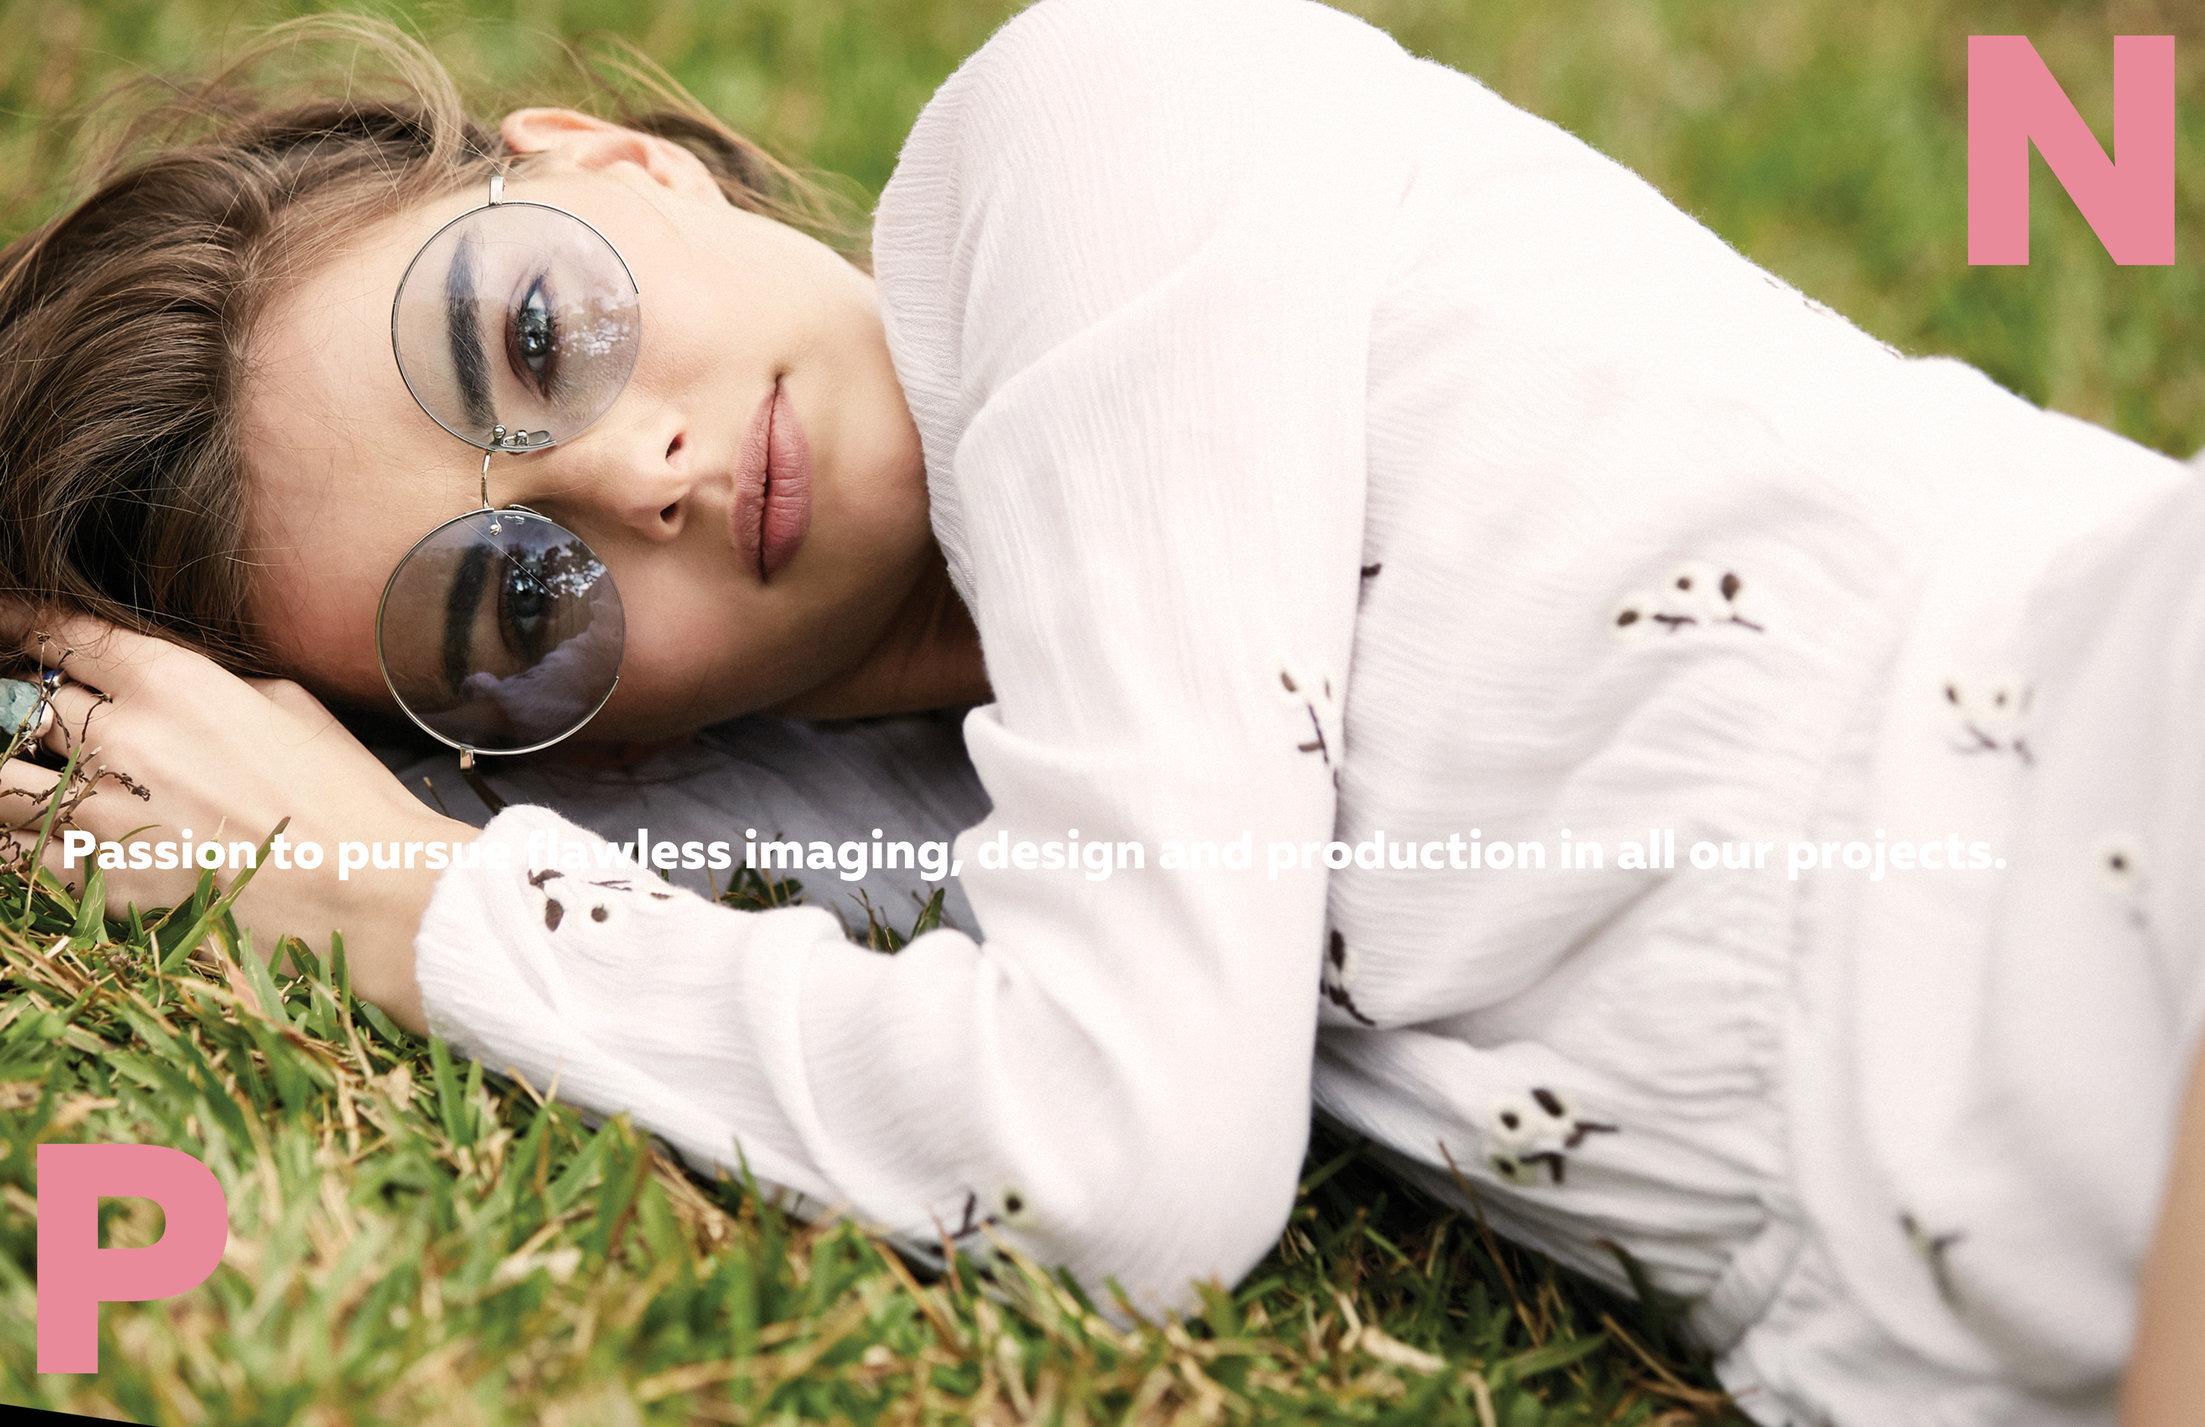 fashion-photographer-nico-stipcianos-miami-copy-8-das-model-nyc.jpg